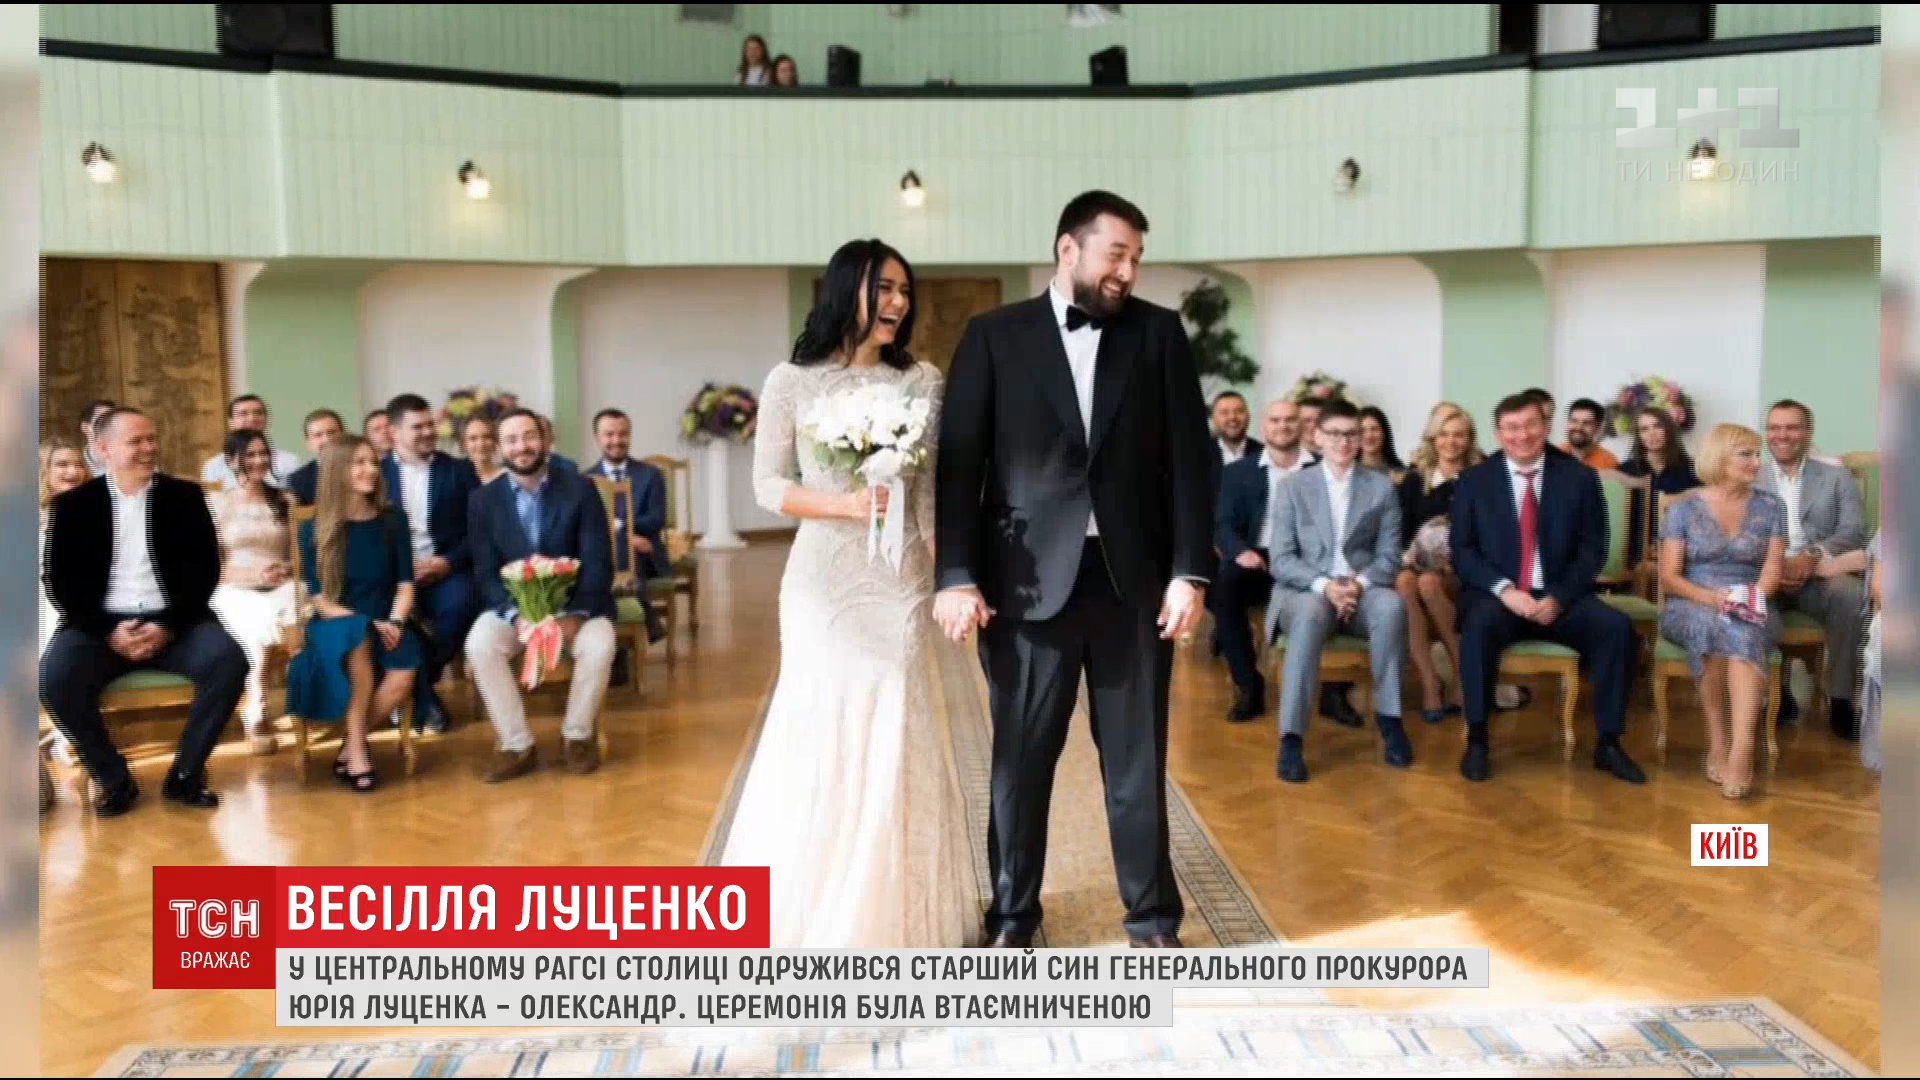 Старший сын генпрокурора Луценко женился / ТСН